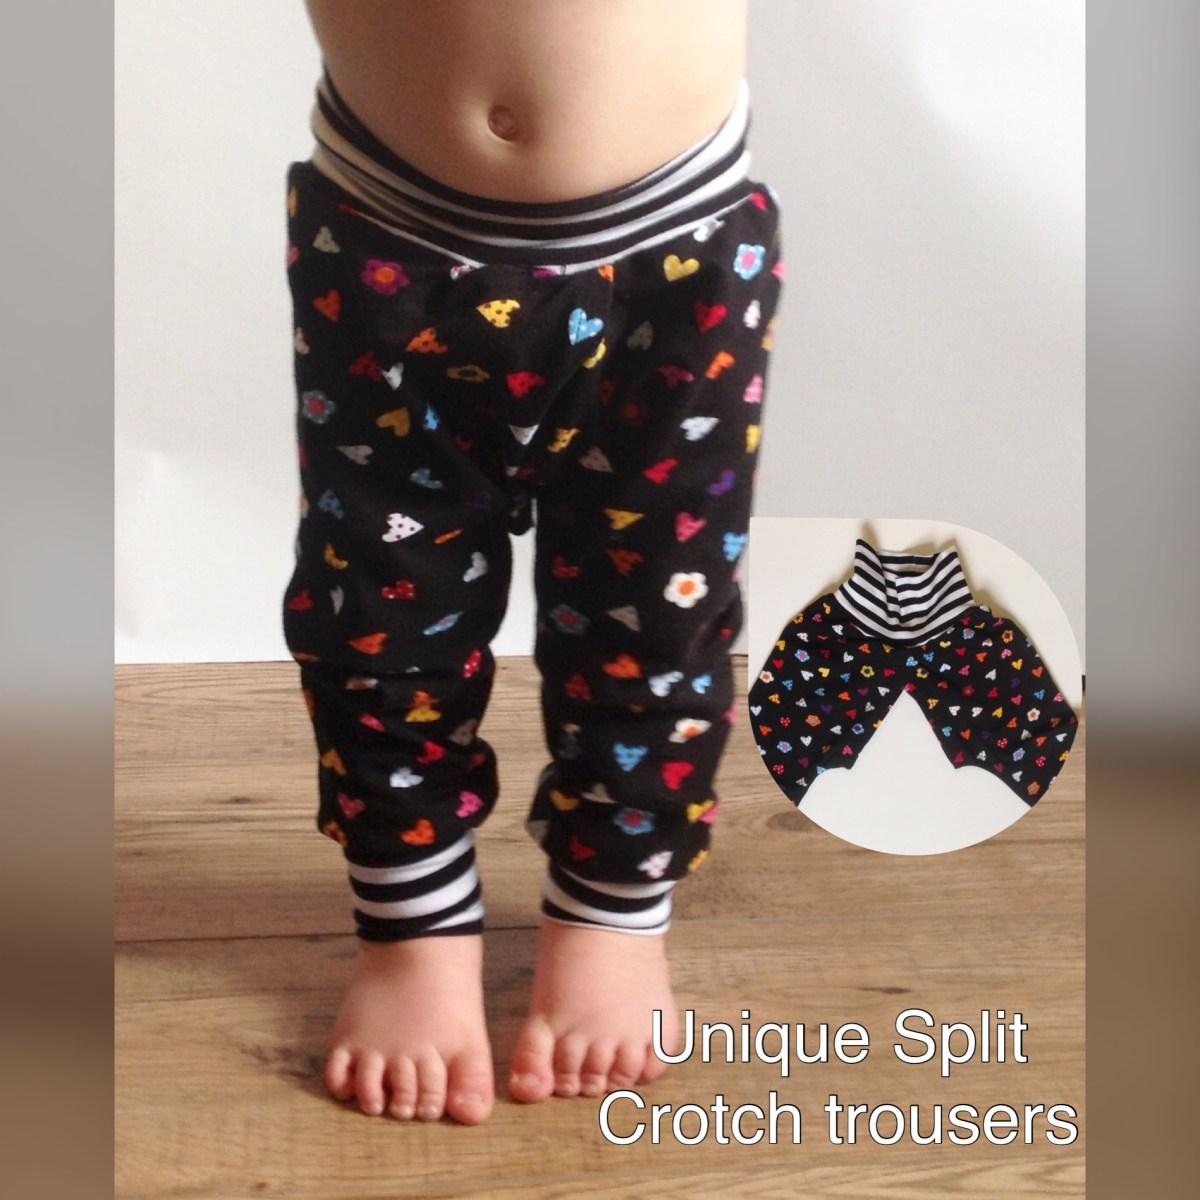 Split crotch baby trousers pants EC Clothing